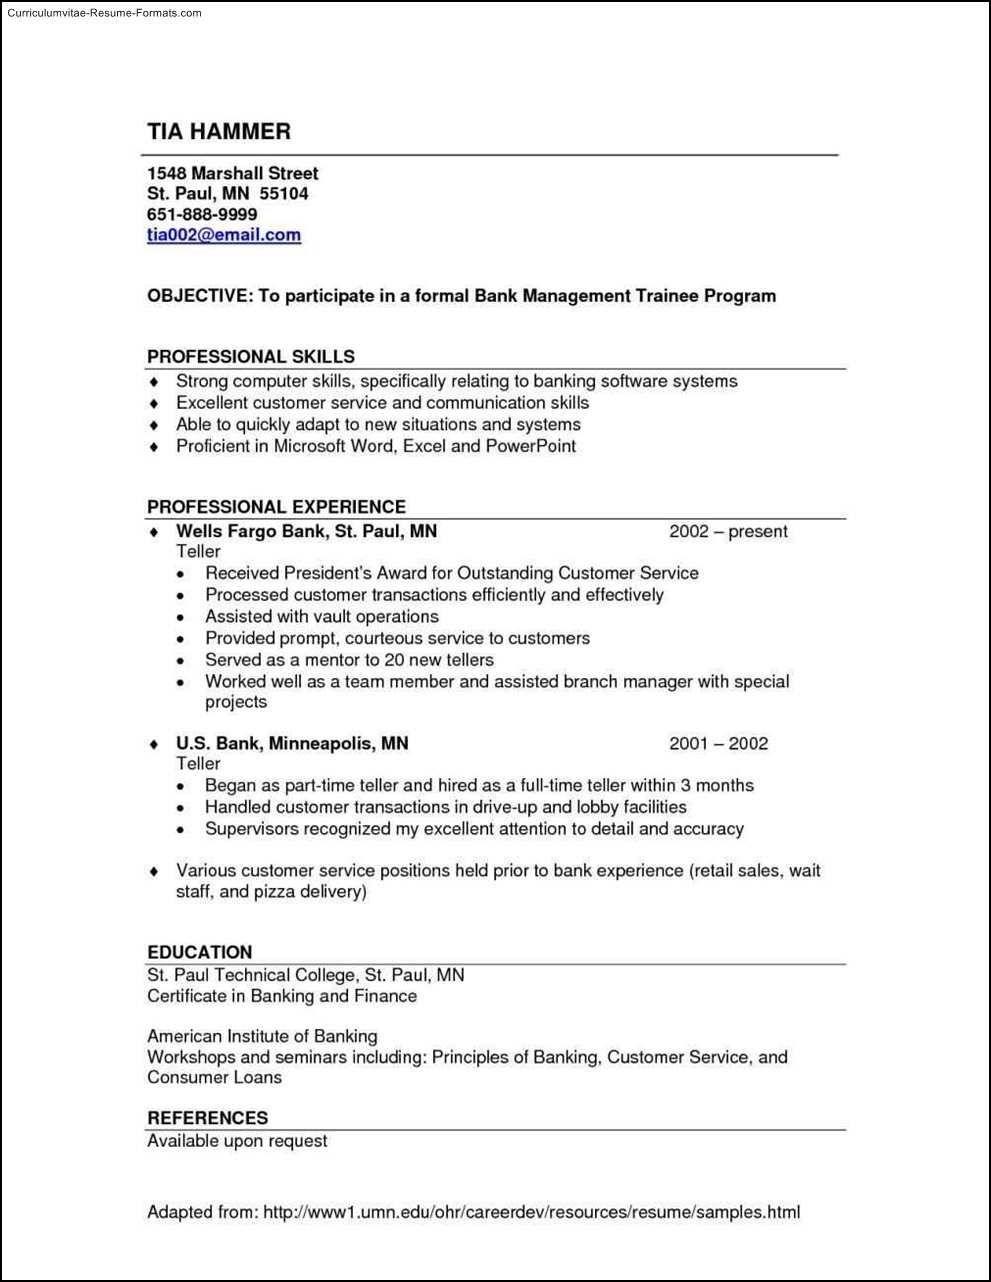 Resume For Bank Tellers Excellent Bank Teller Resume Sample